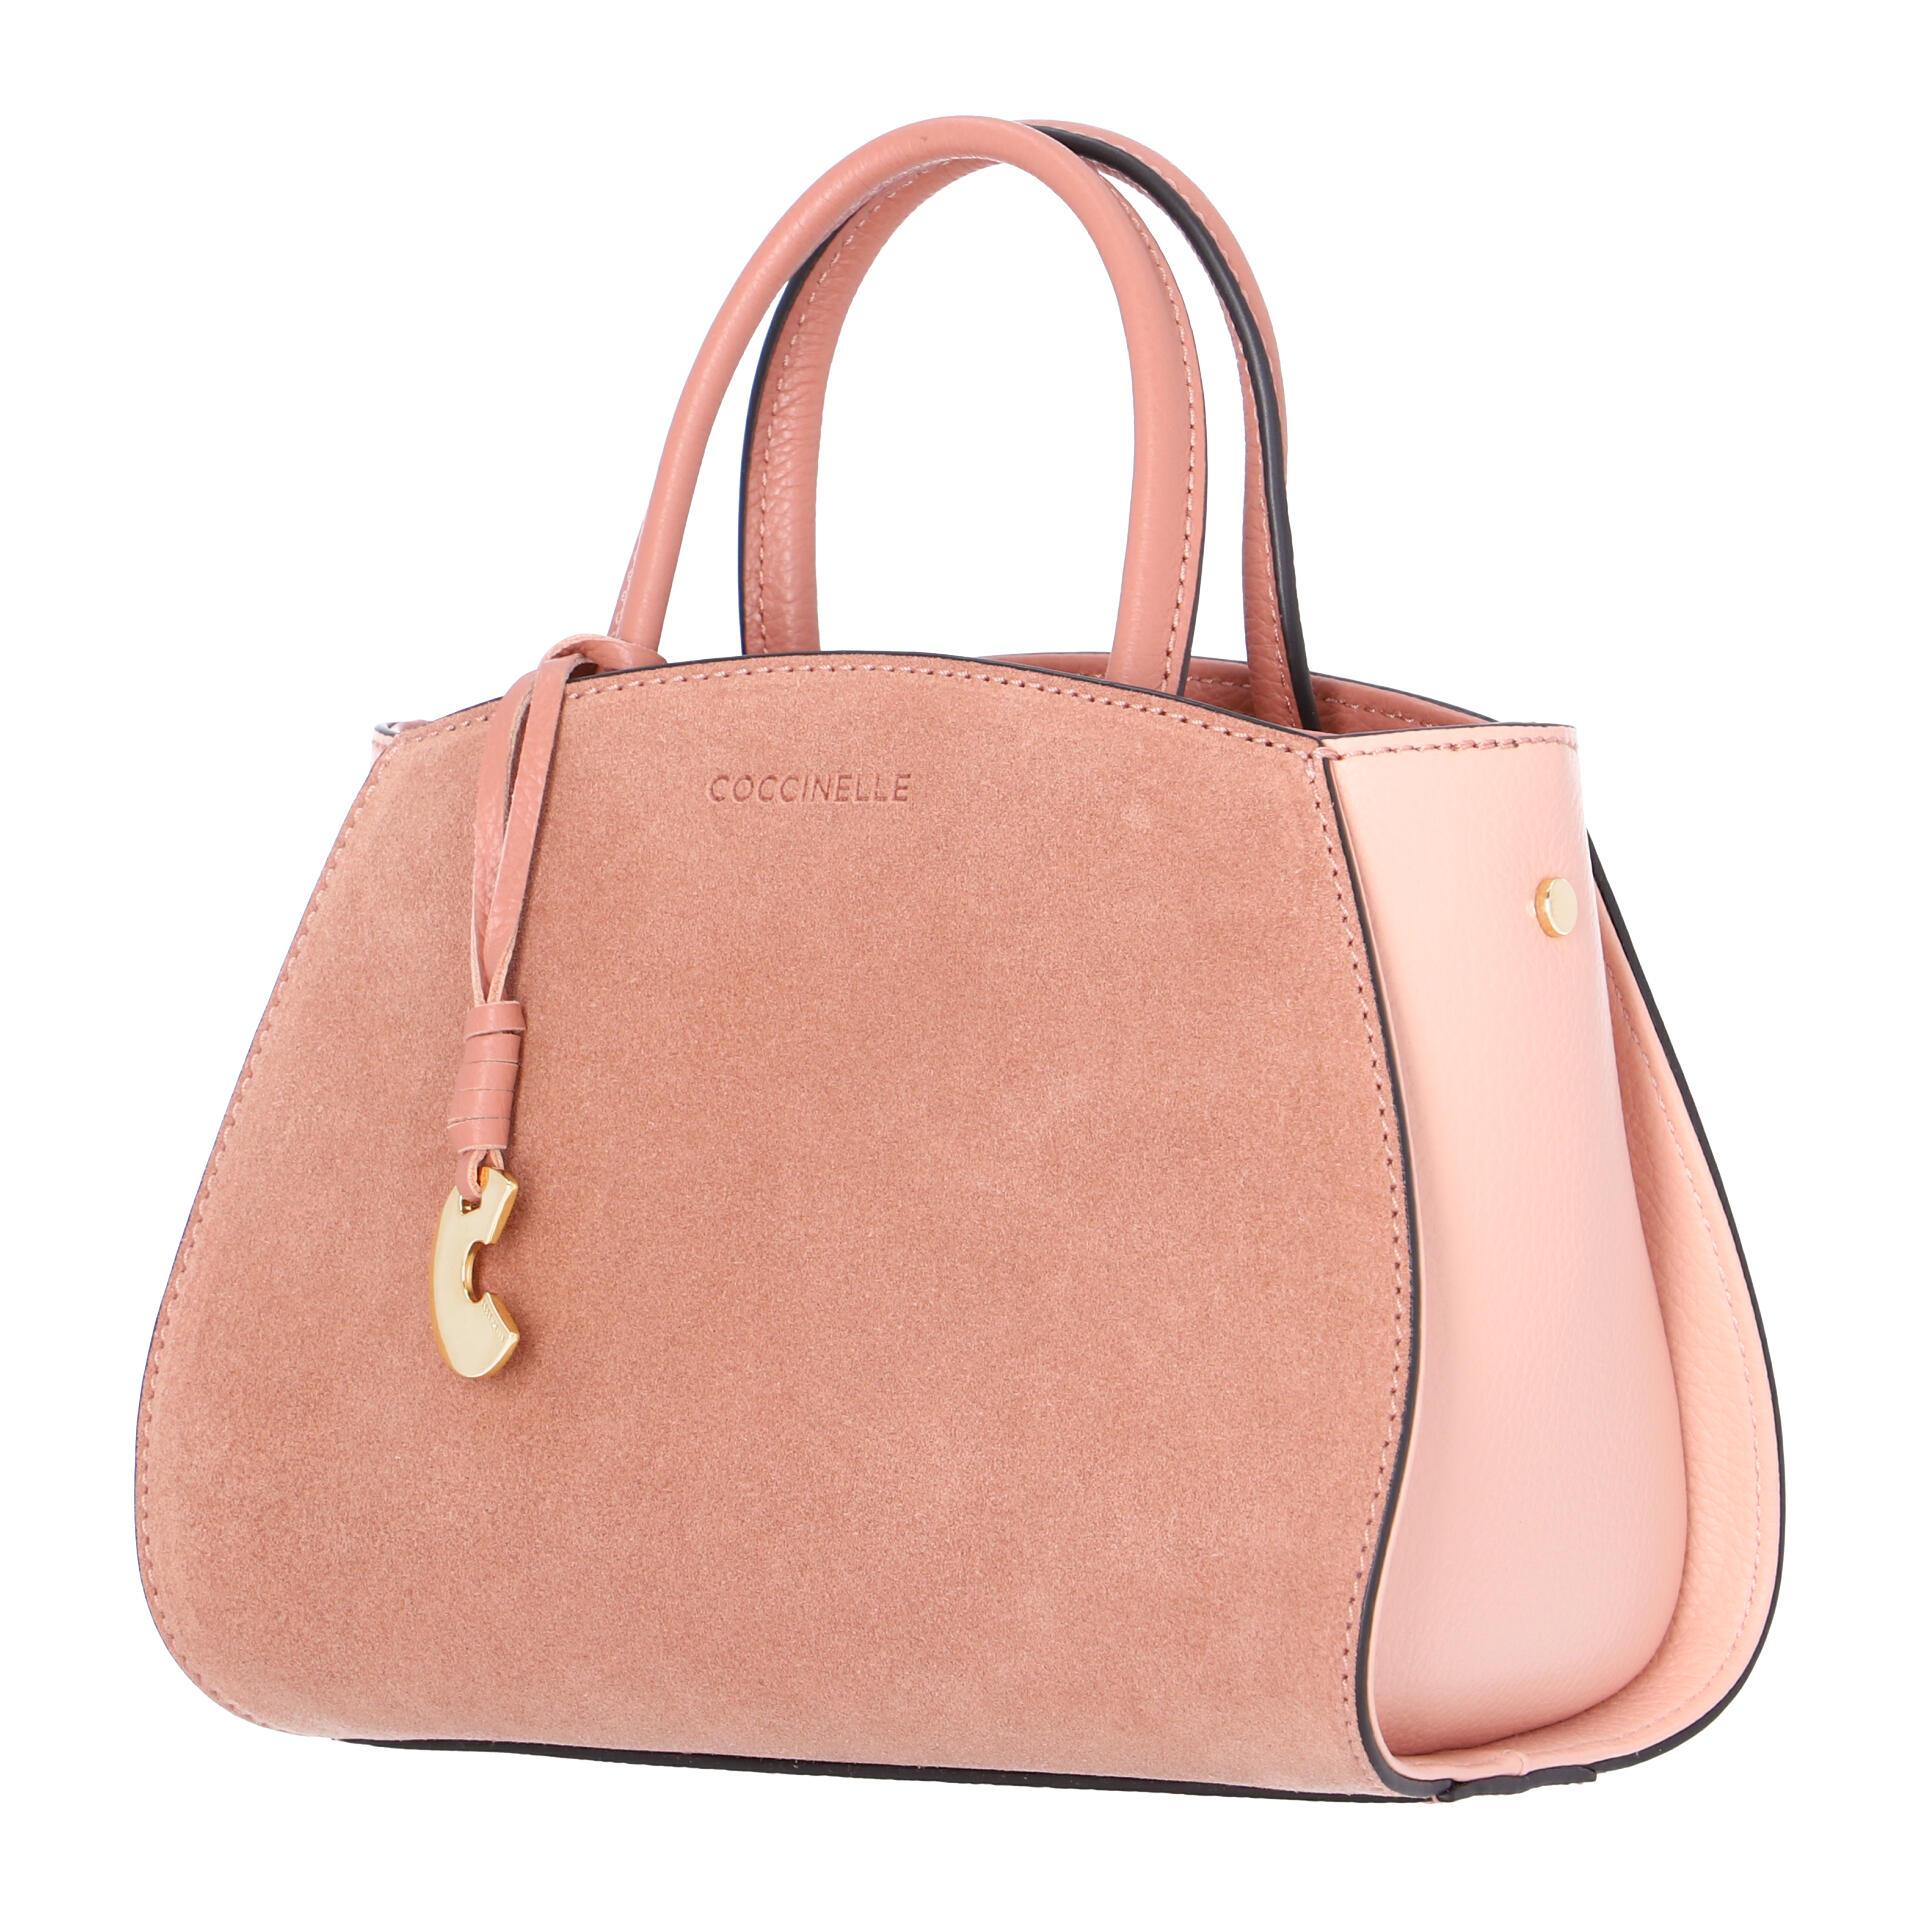 Concrete Bicolor Suede Mini Handtasche aus Wildleder  litchi/rose